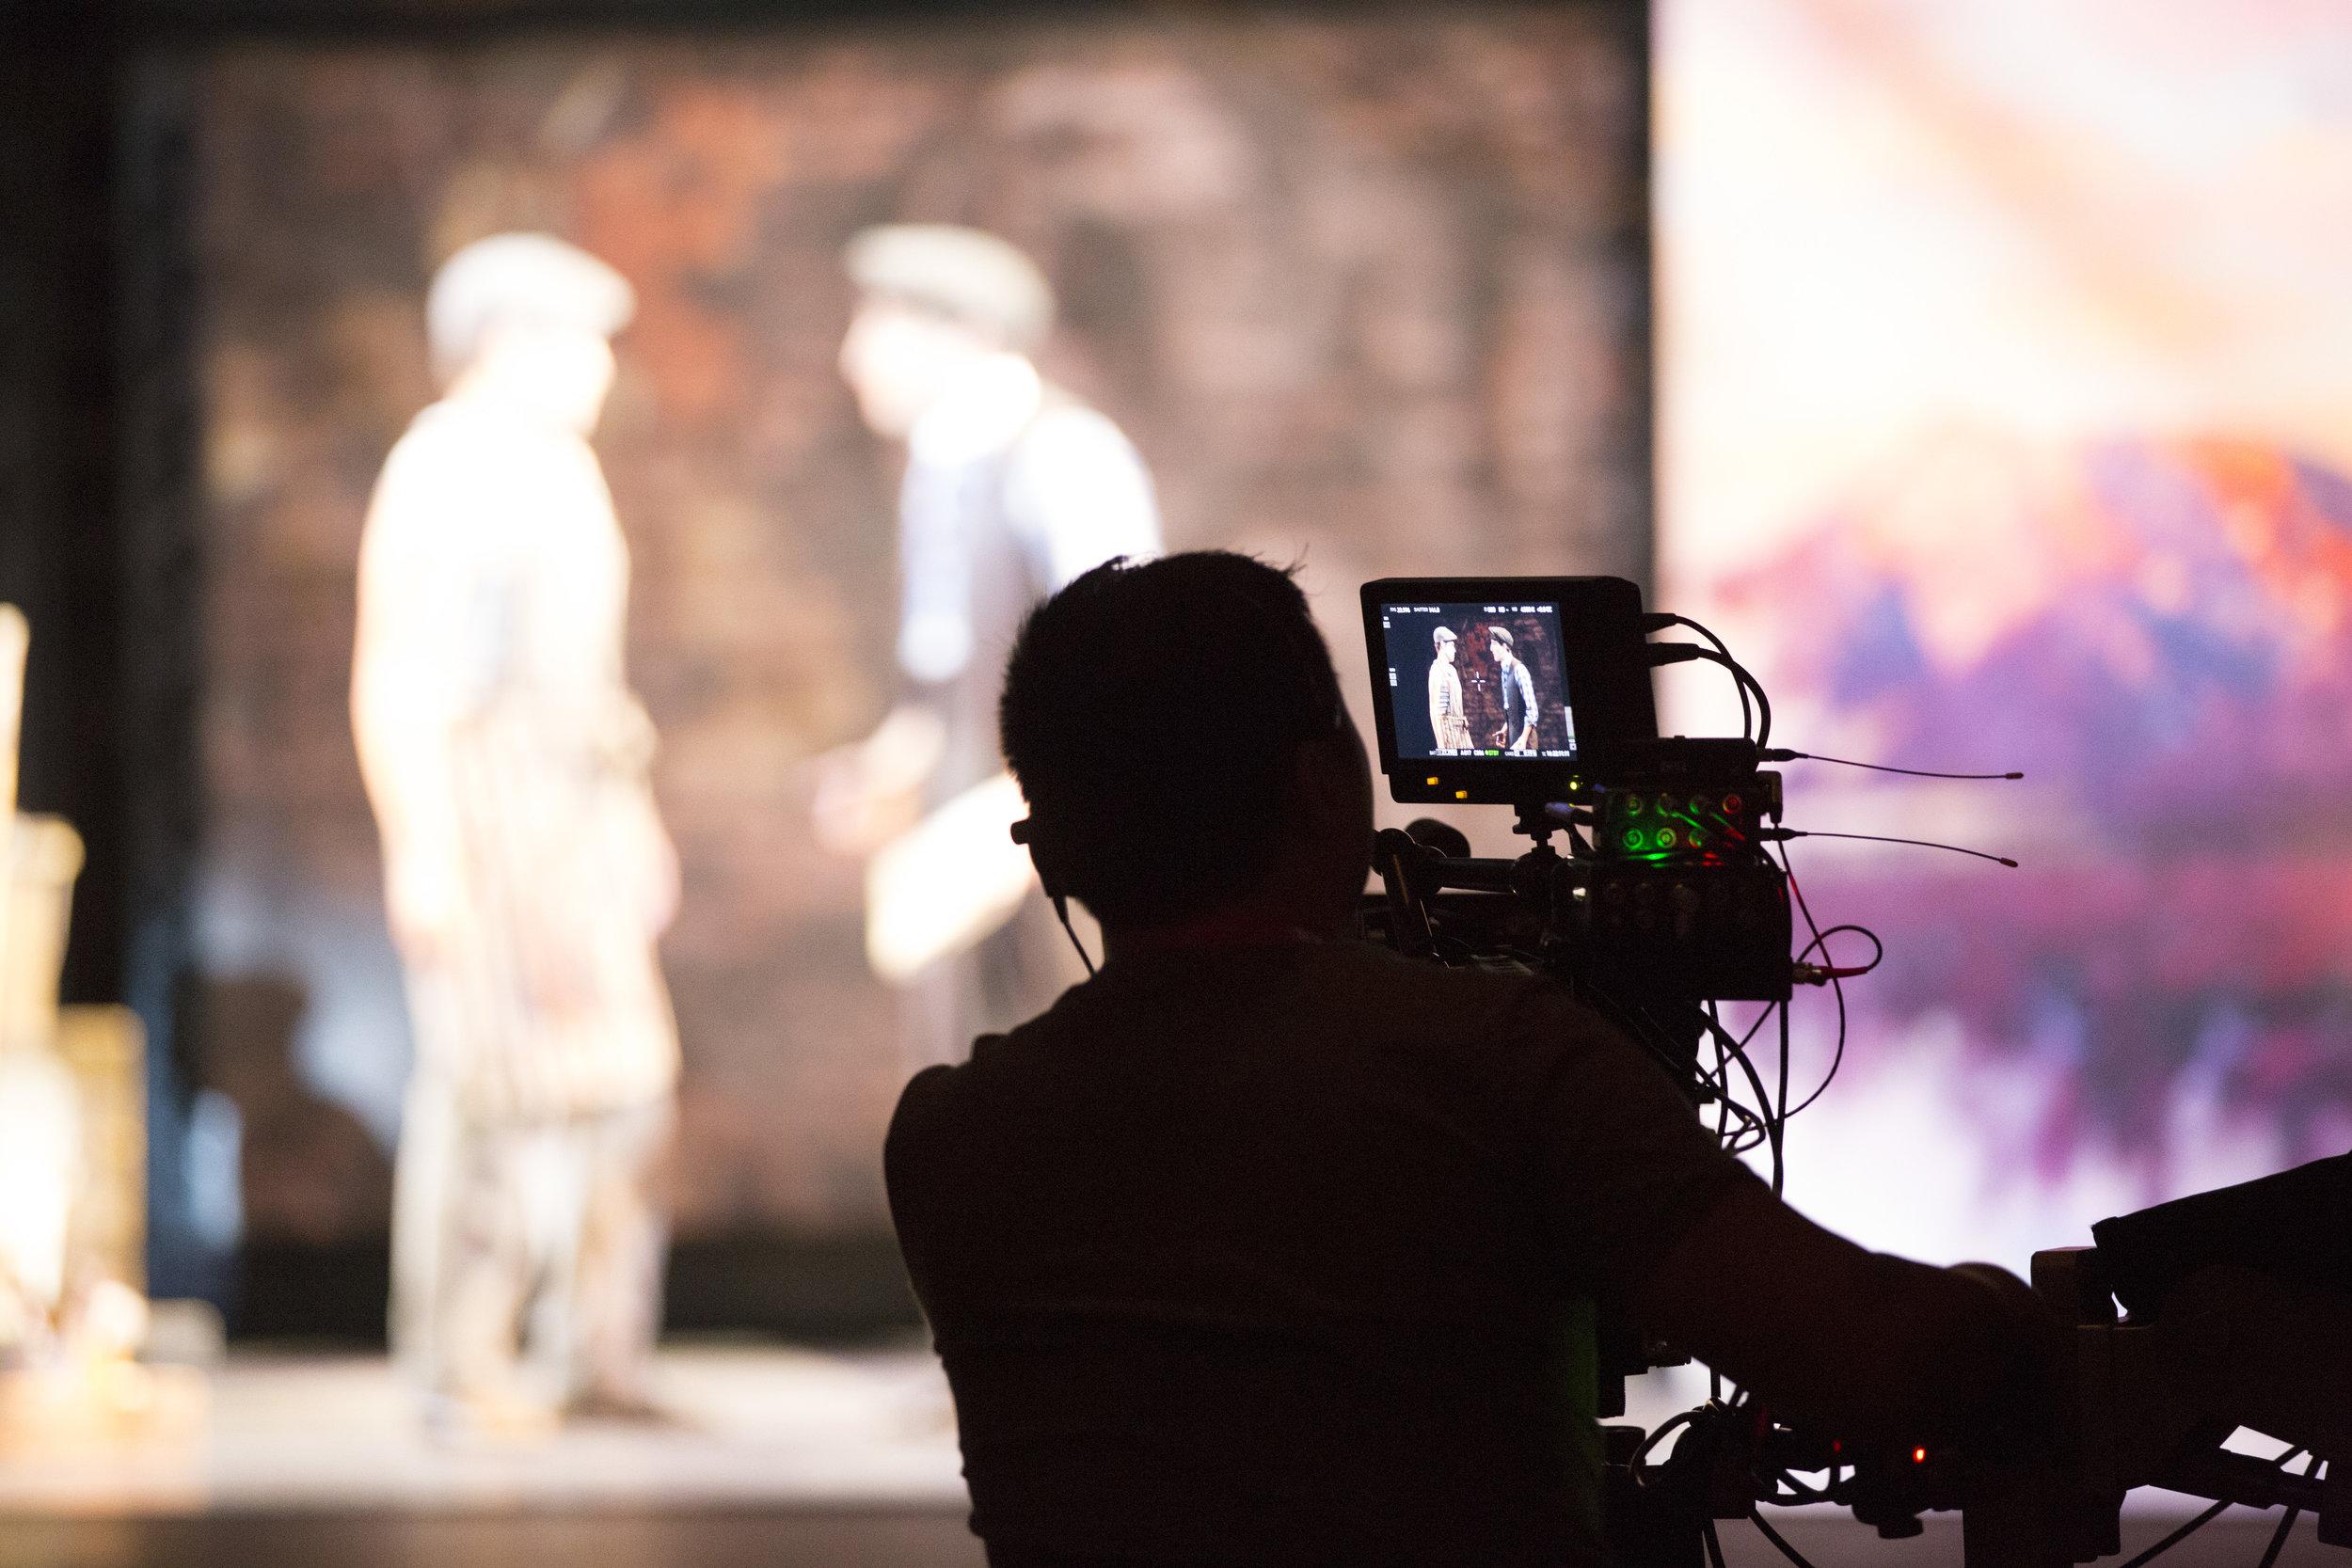 Newsies_Filming_JeremyJordan_BenFankhauser_Photo_By_Disney_Theatrical_Productions2.jpg